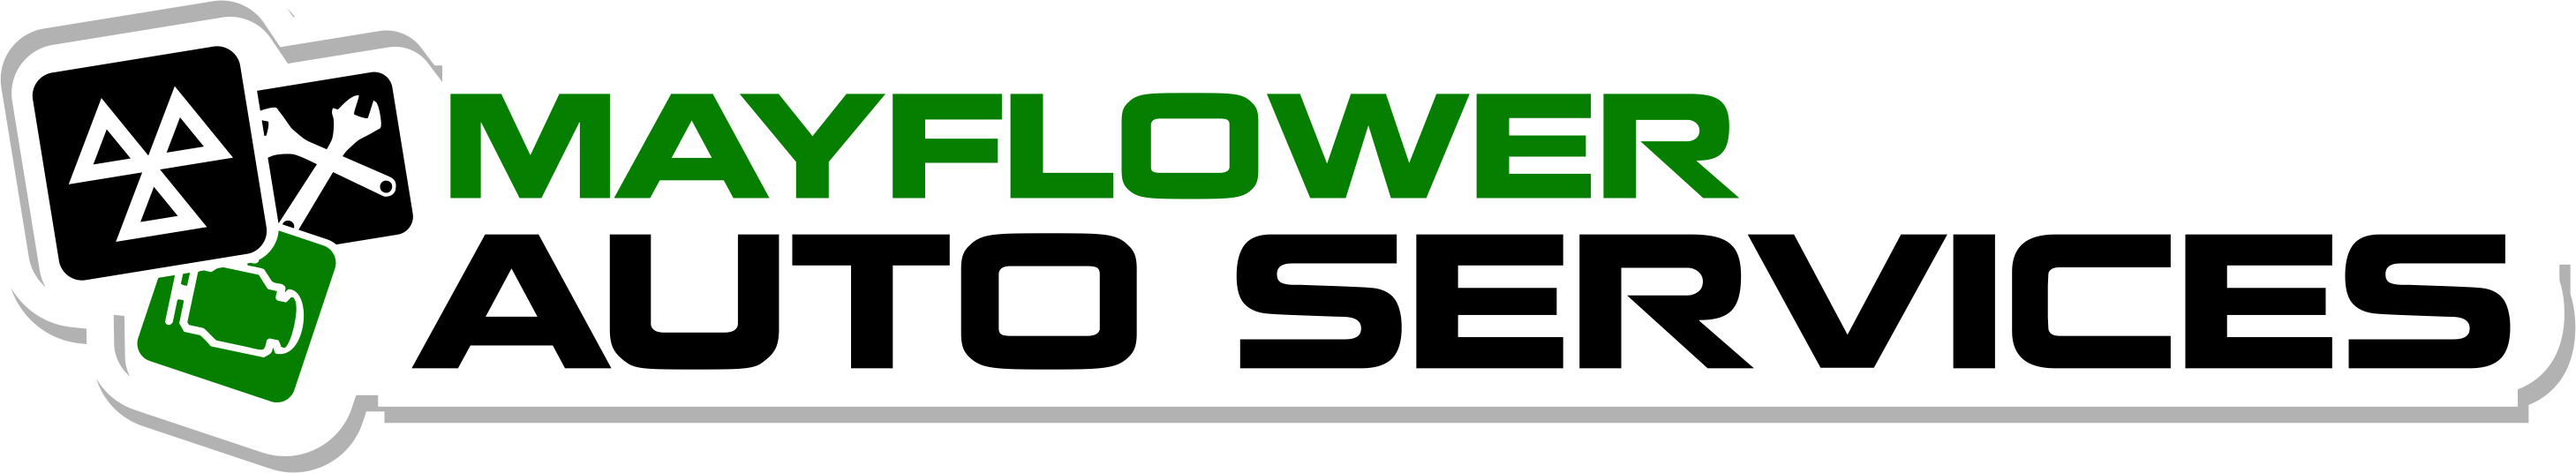 Mayflower Auto Services Logo